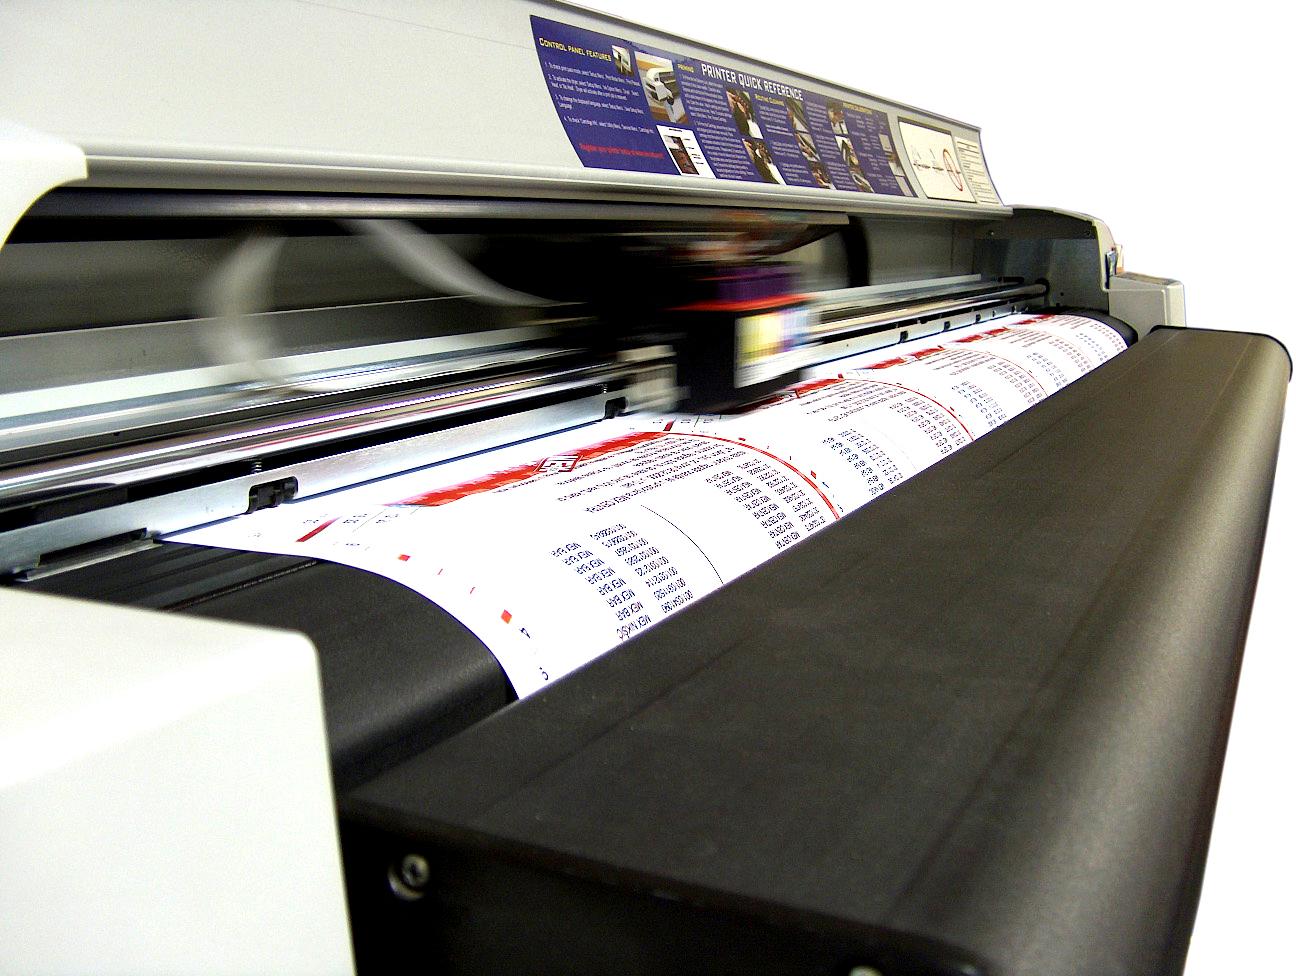 bordentown-nj-printer